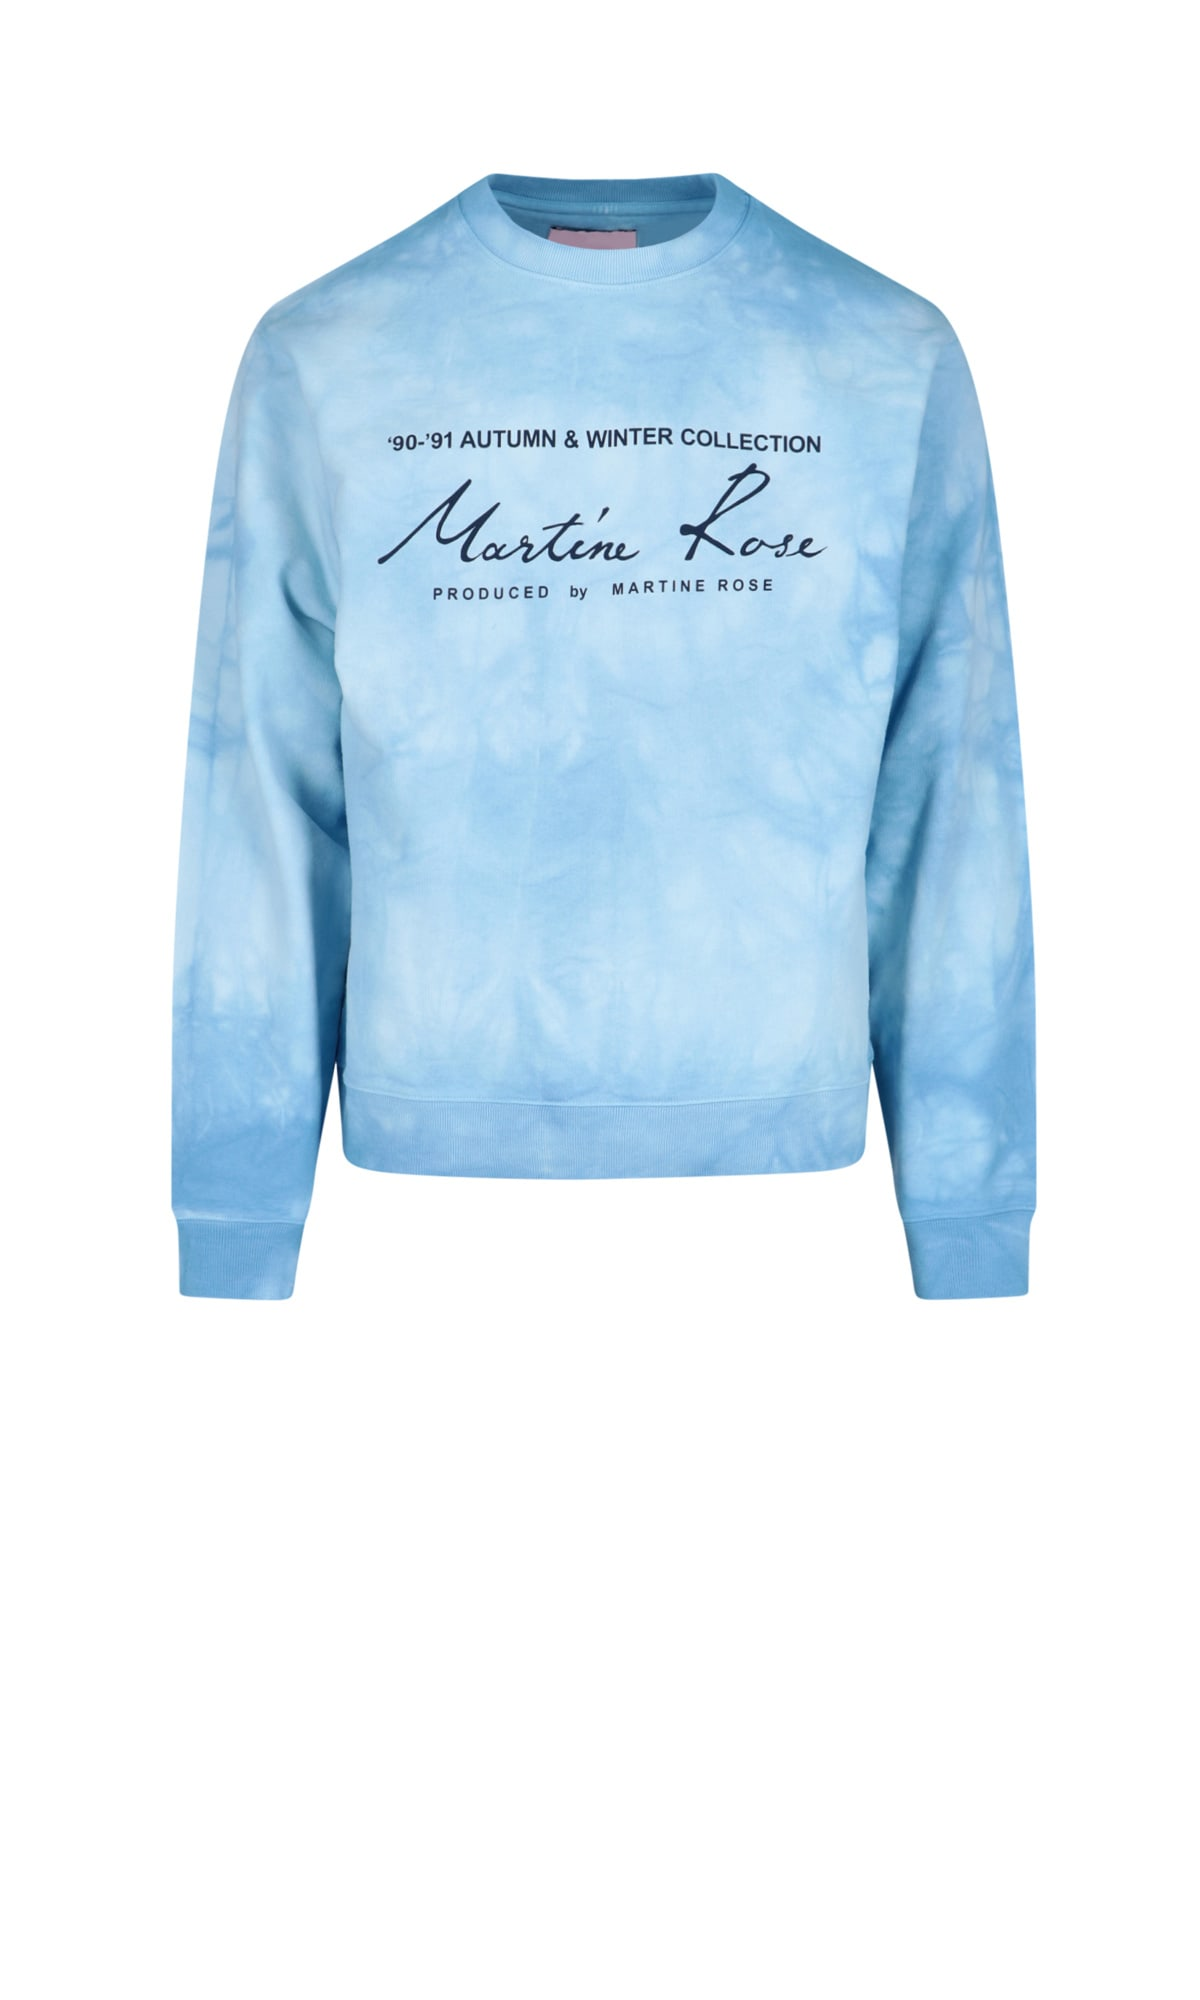 Martine Rose Sweater